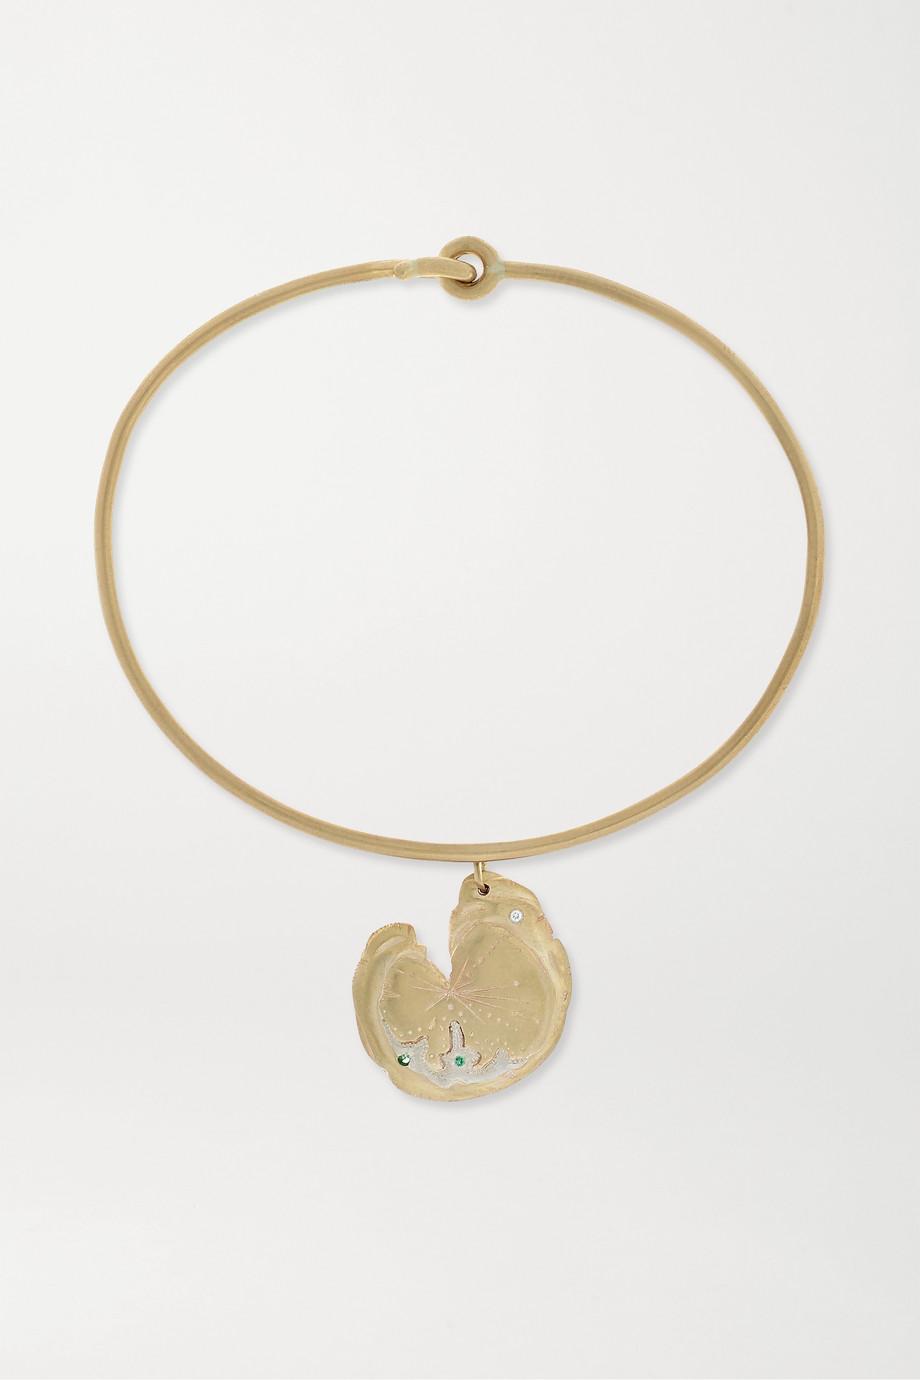 Pascale Monvoisin Calypso 9-karat gold, sterling silver, emerald and diamond bracelet